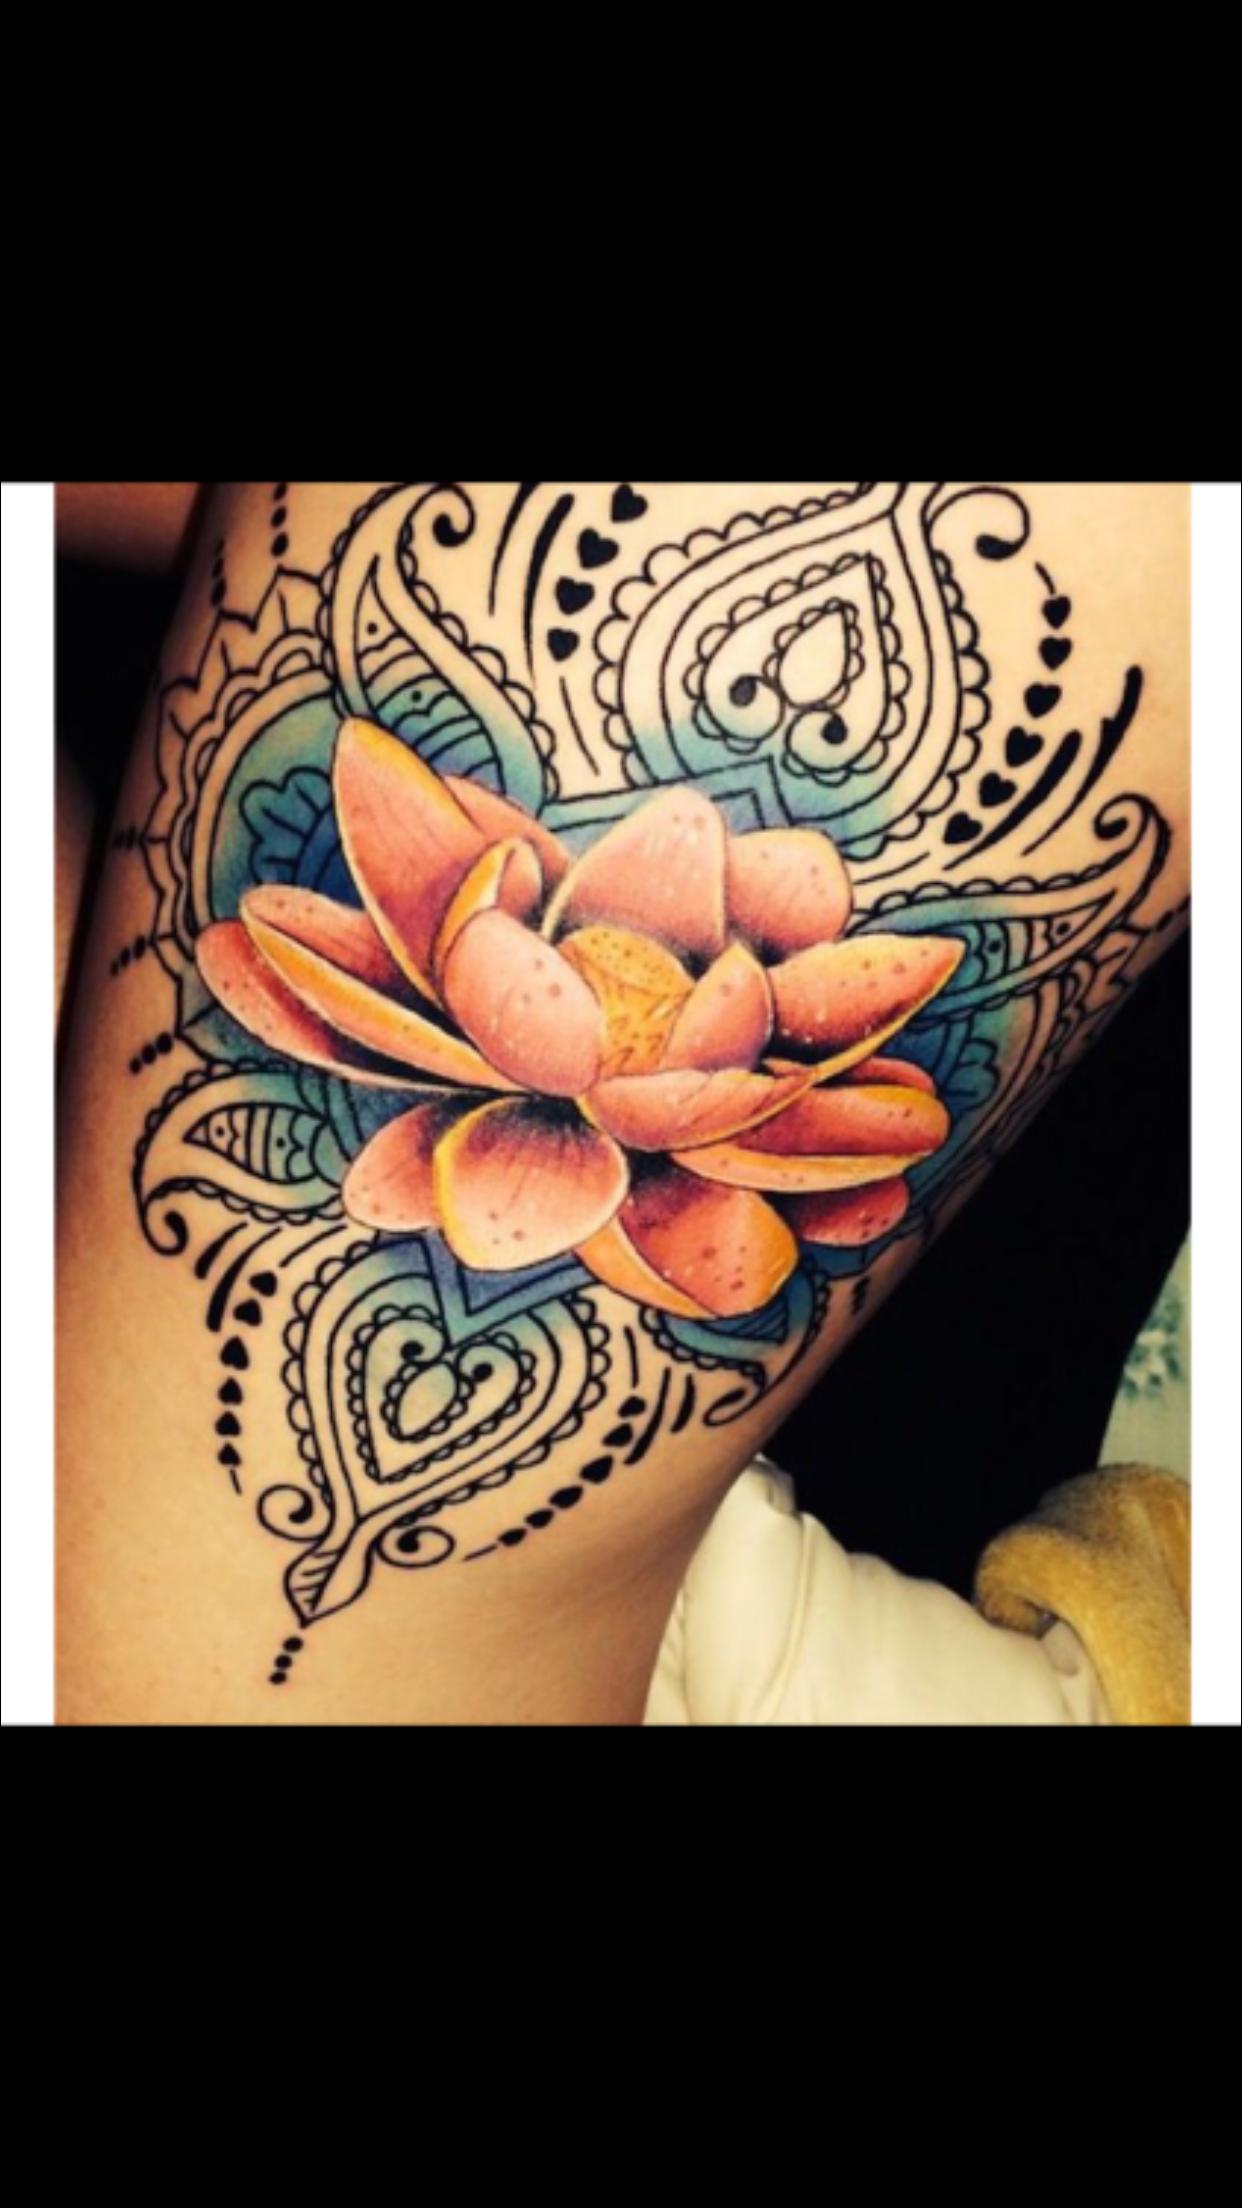 Pin by kelli stephenson on tattoos pinterest tattoos flower lotis flower tattoo lotus flower tattoo meaning black lotus tattoo flower tattoo women izmirmasajfo